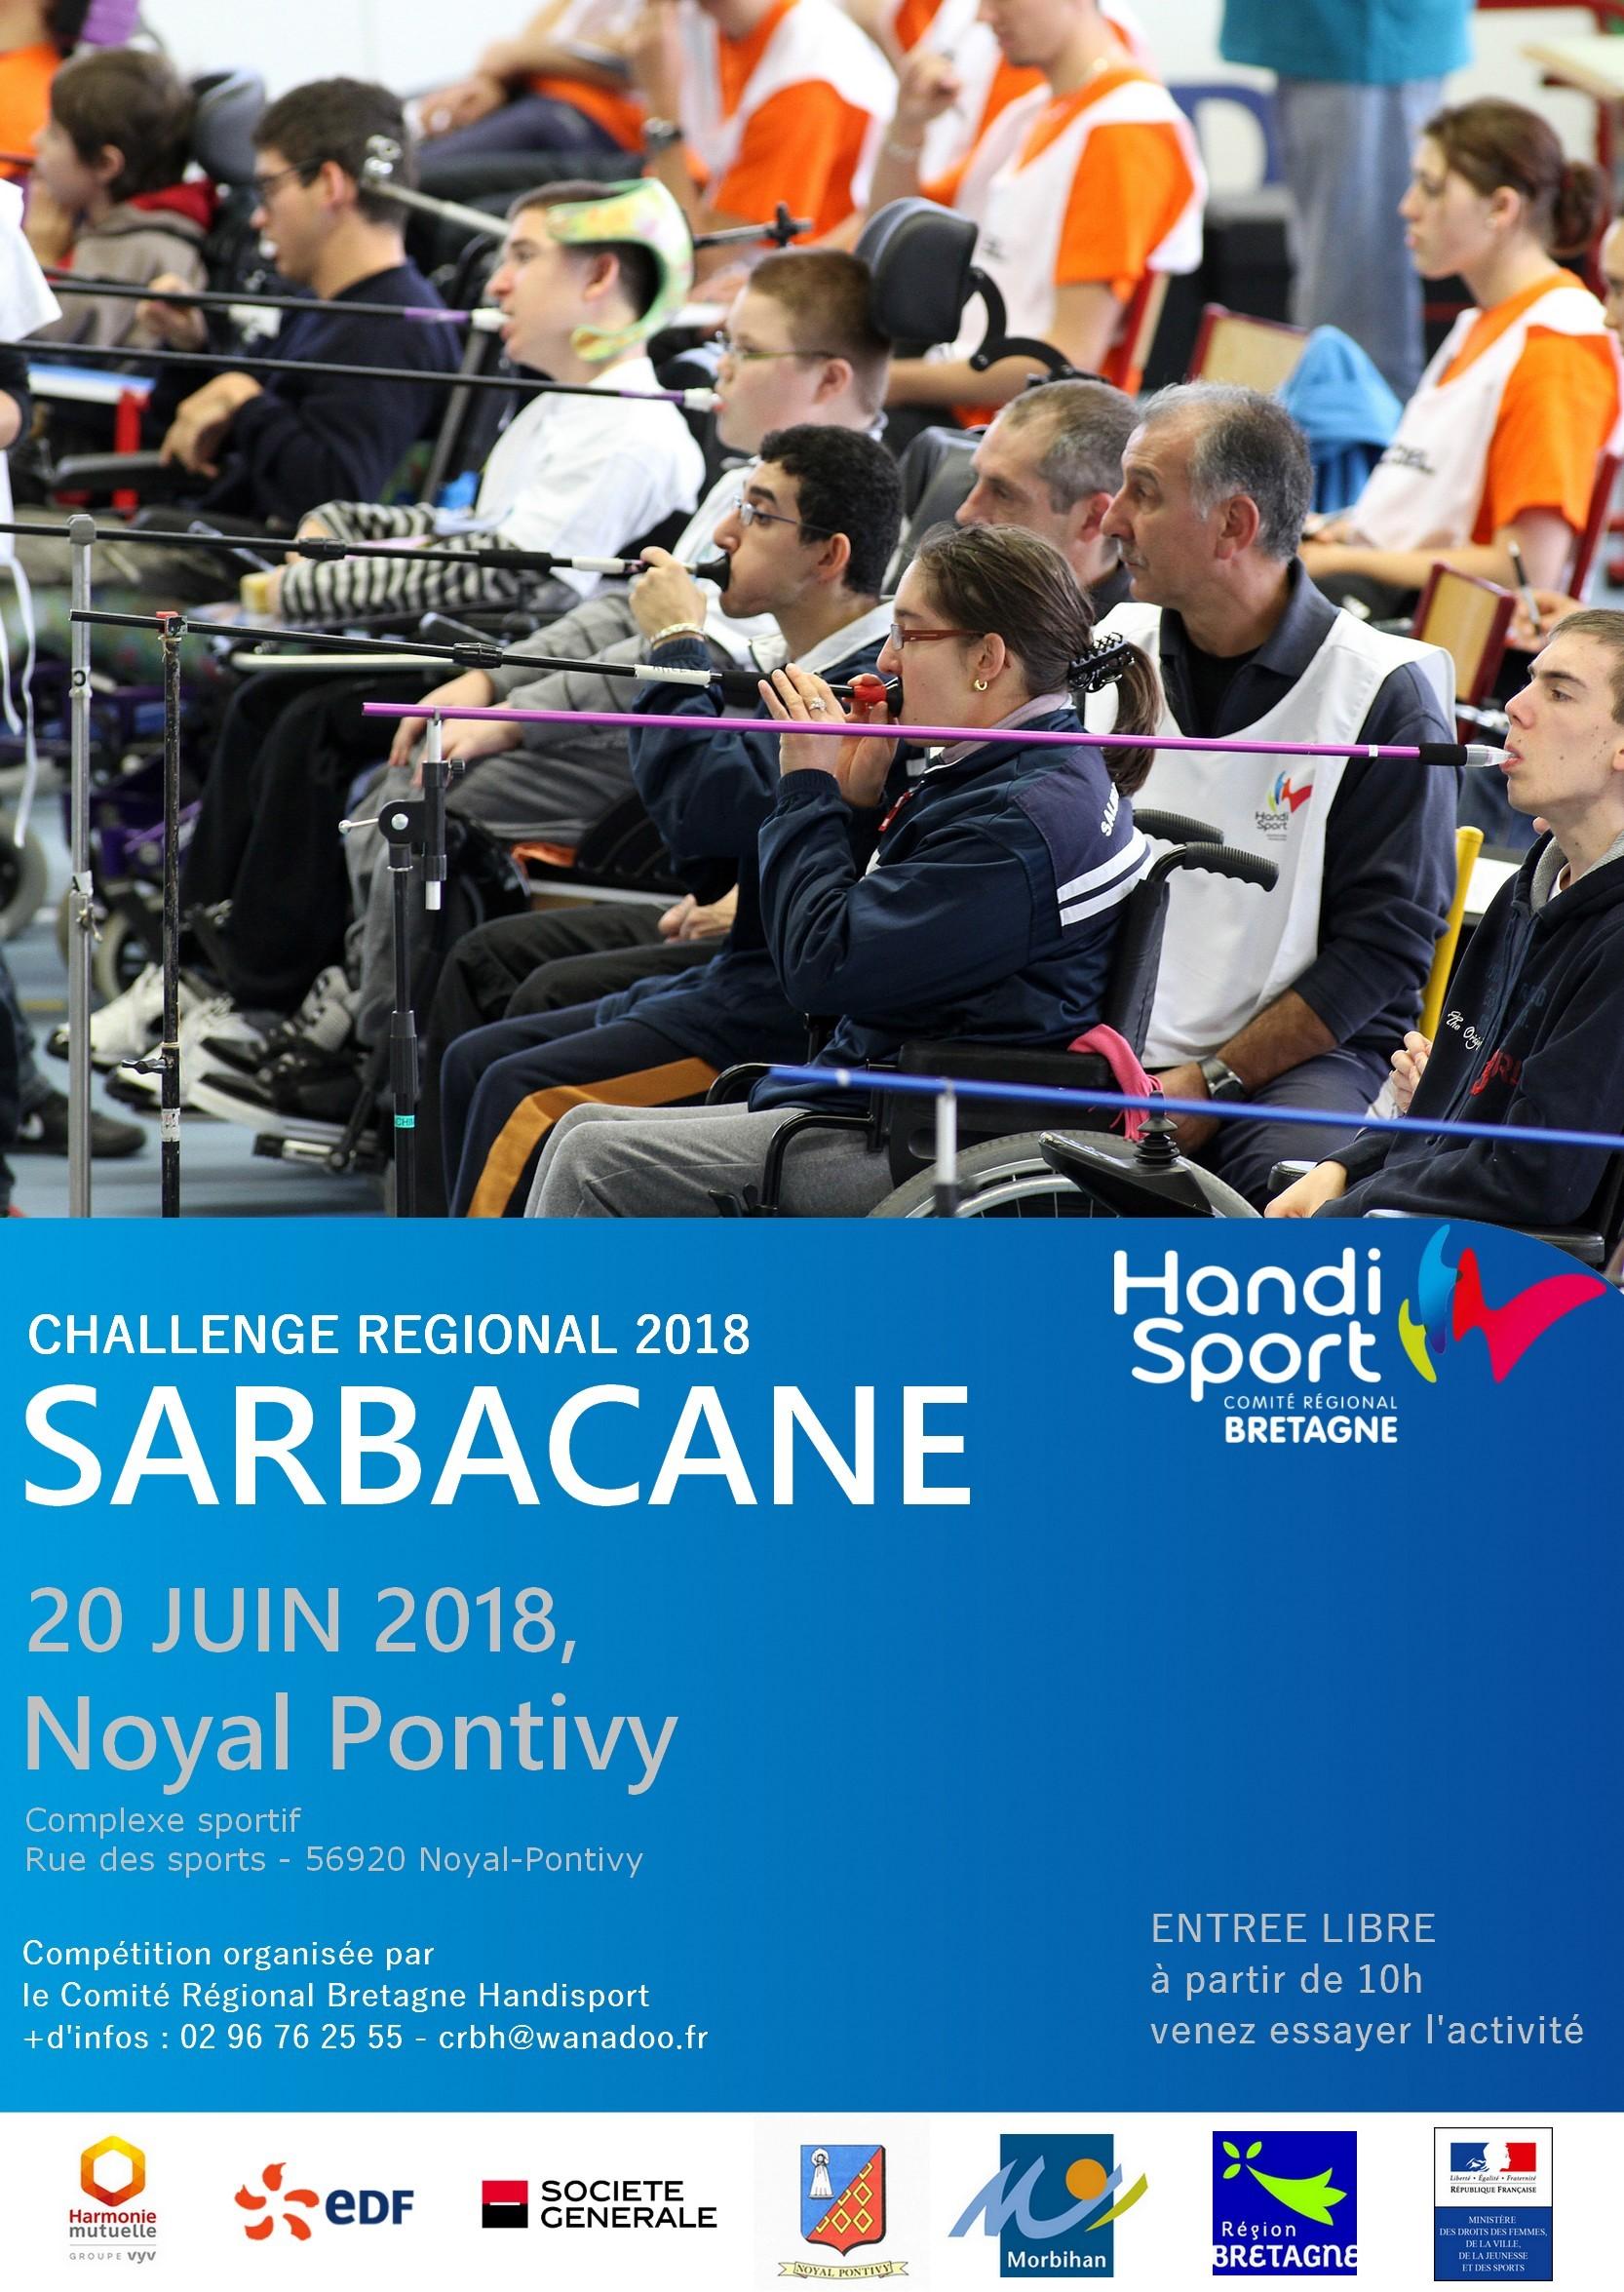 HandiSport Sarbacane